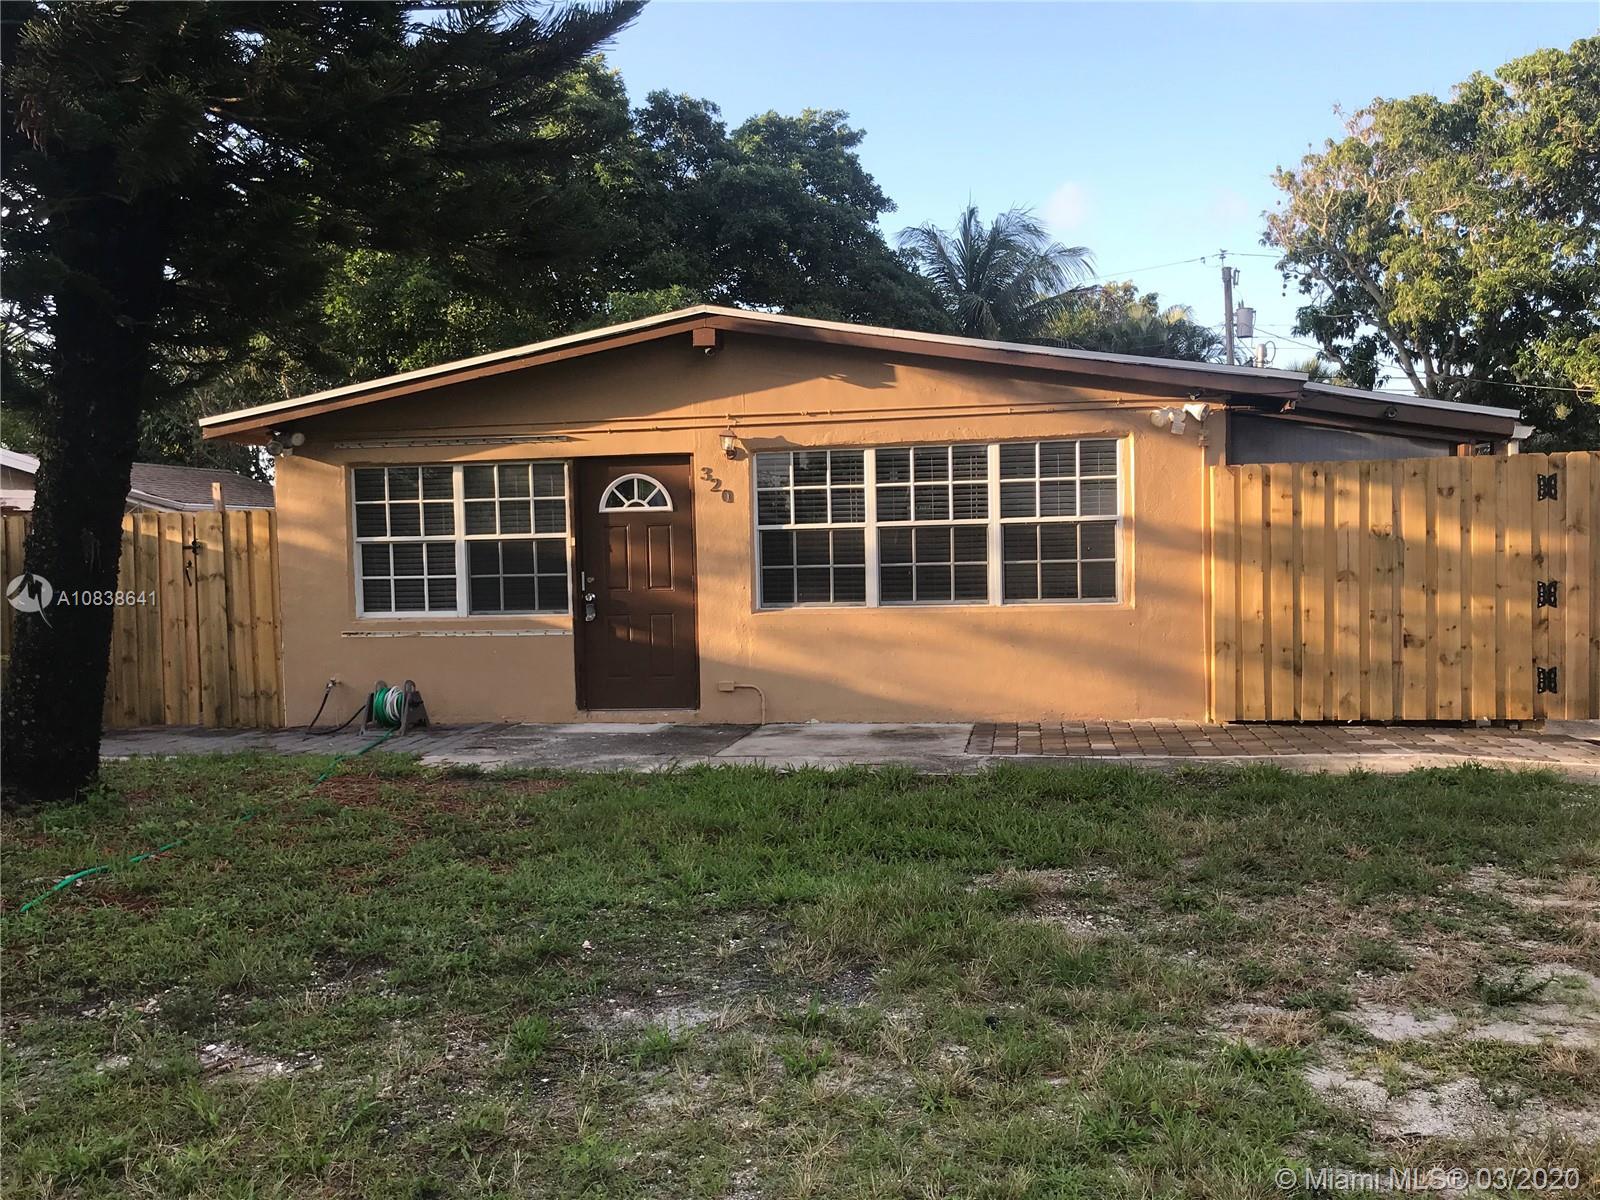 320 Ipswich St, Boca Raton, FL 33487